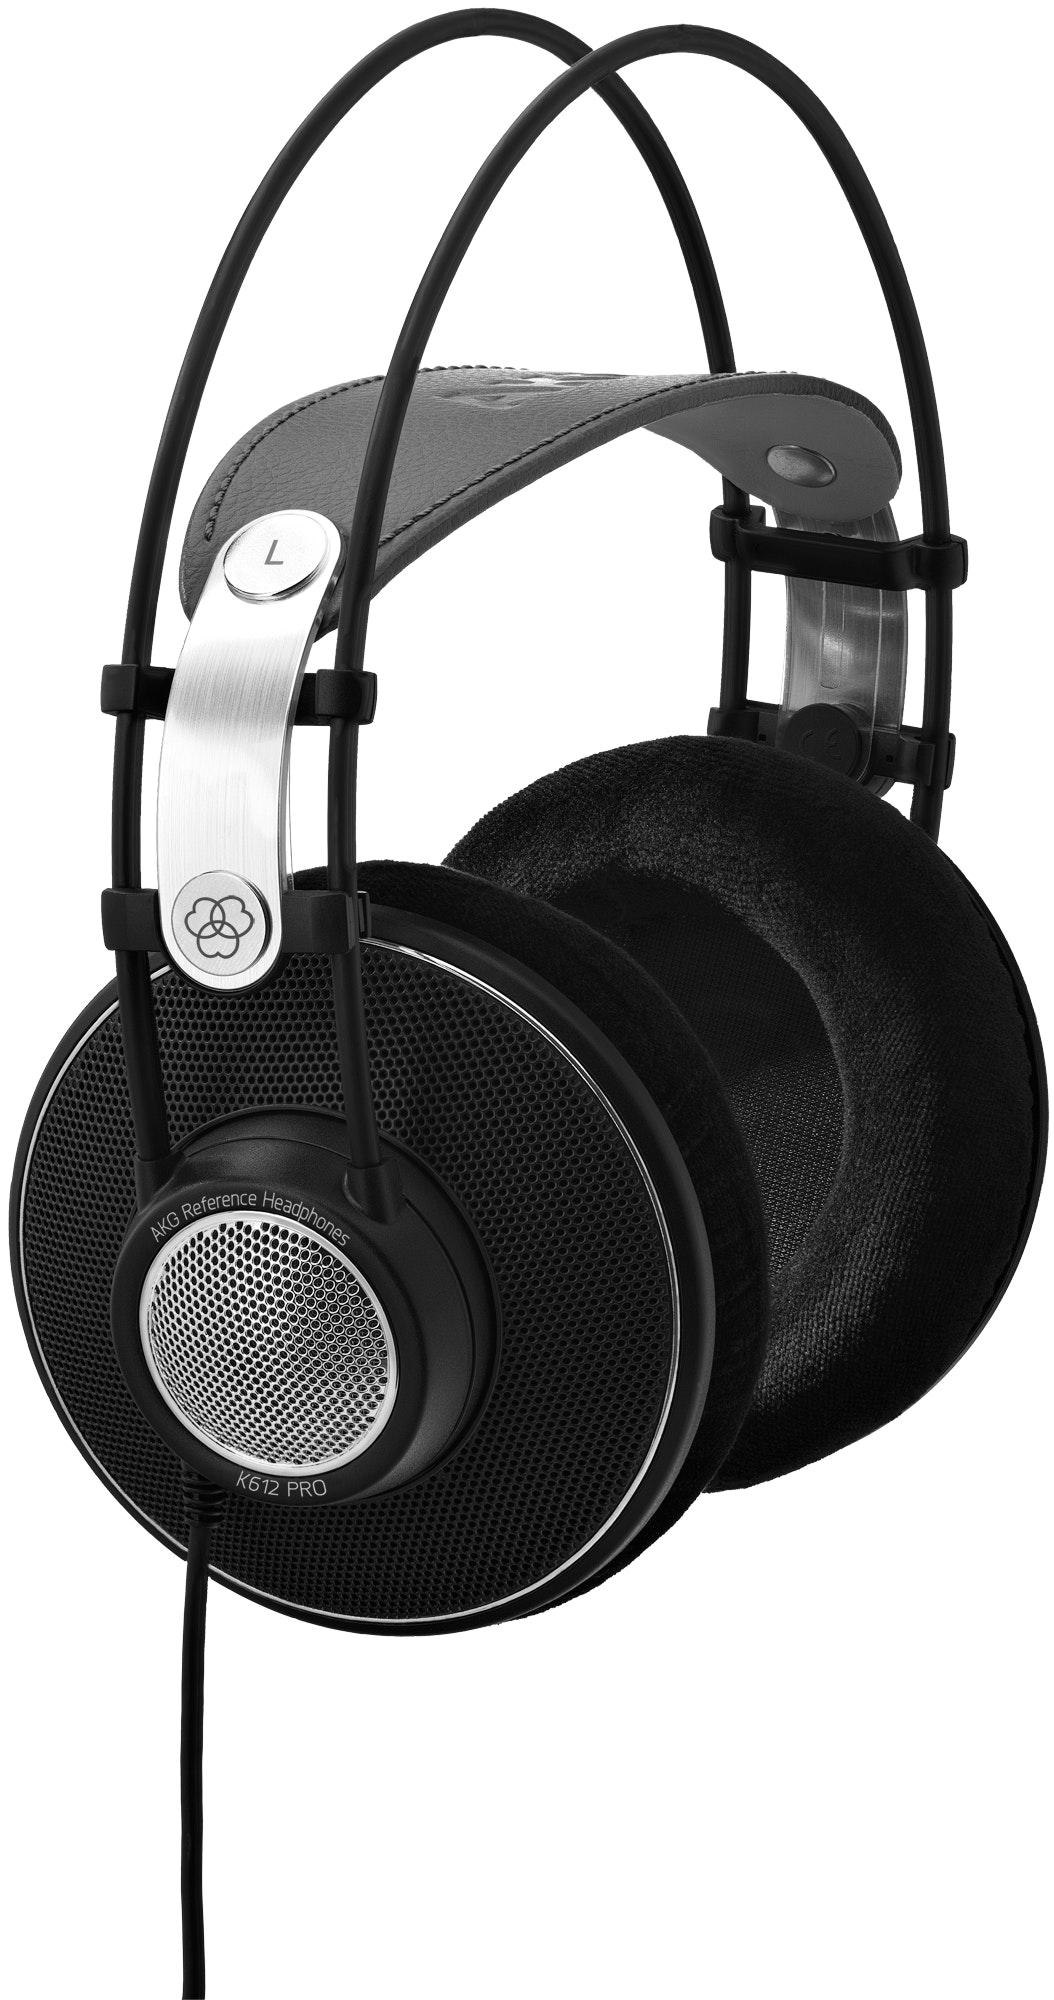 K612 PRO - Reference Studio Headphones | AKG Acoustics